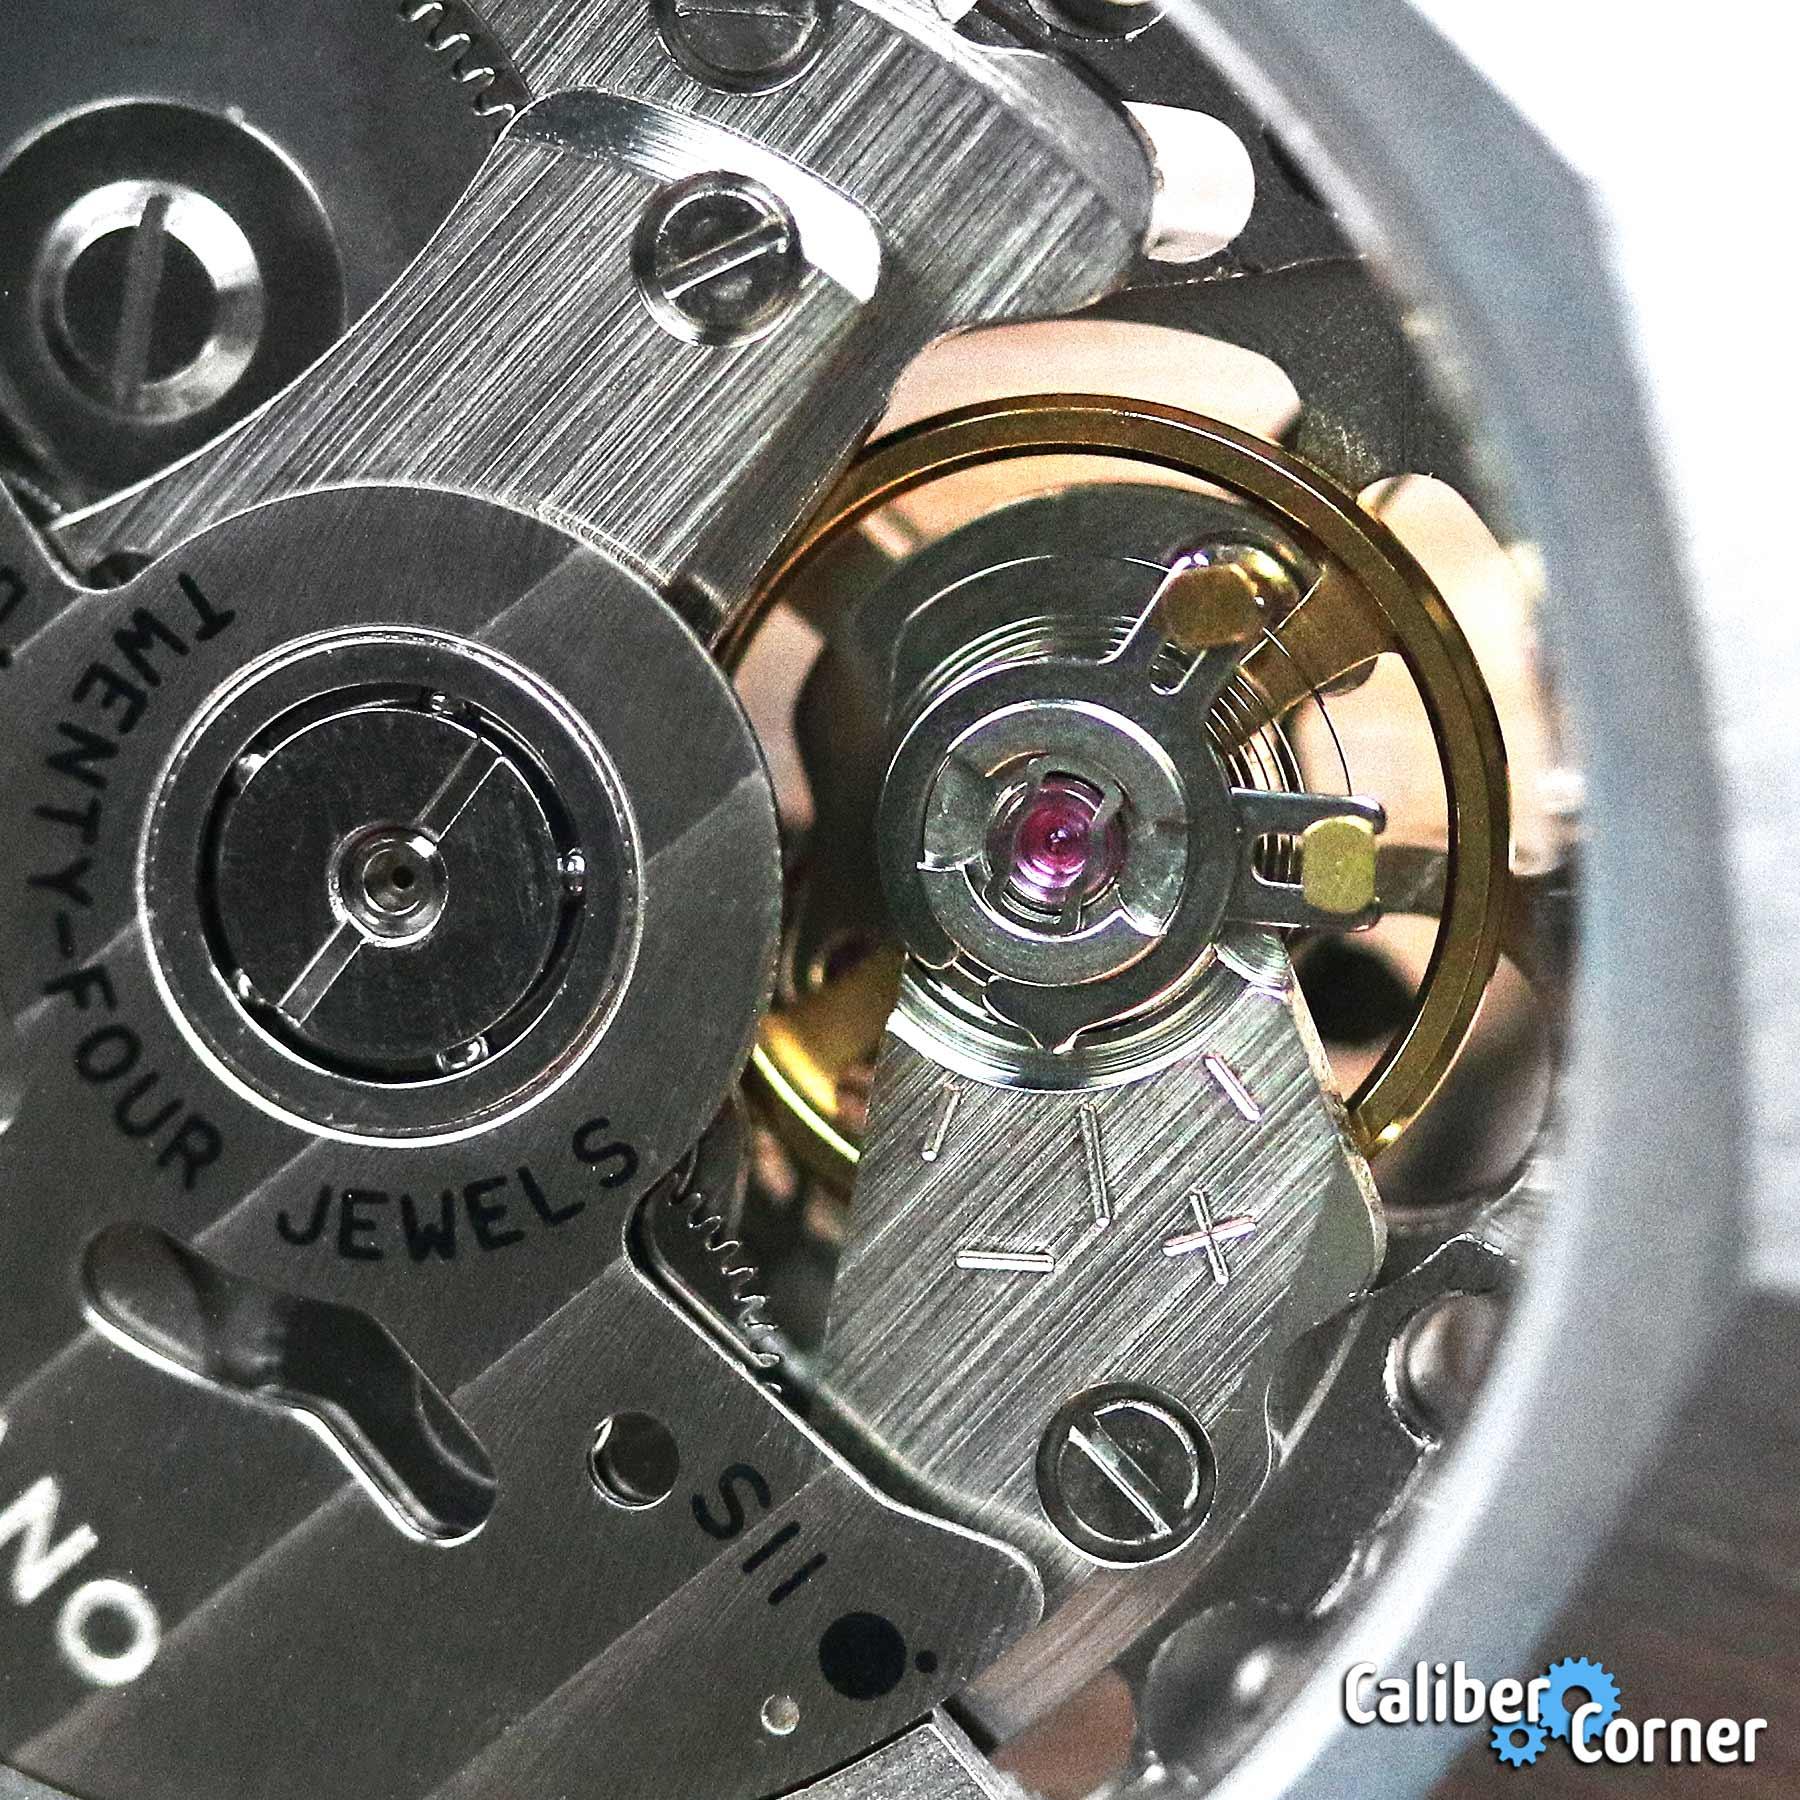 Seiko Caliber Nh70 D1 Milano Macro Balance Wheel